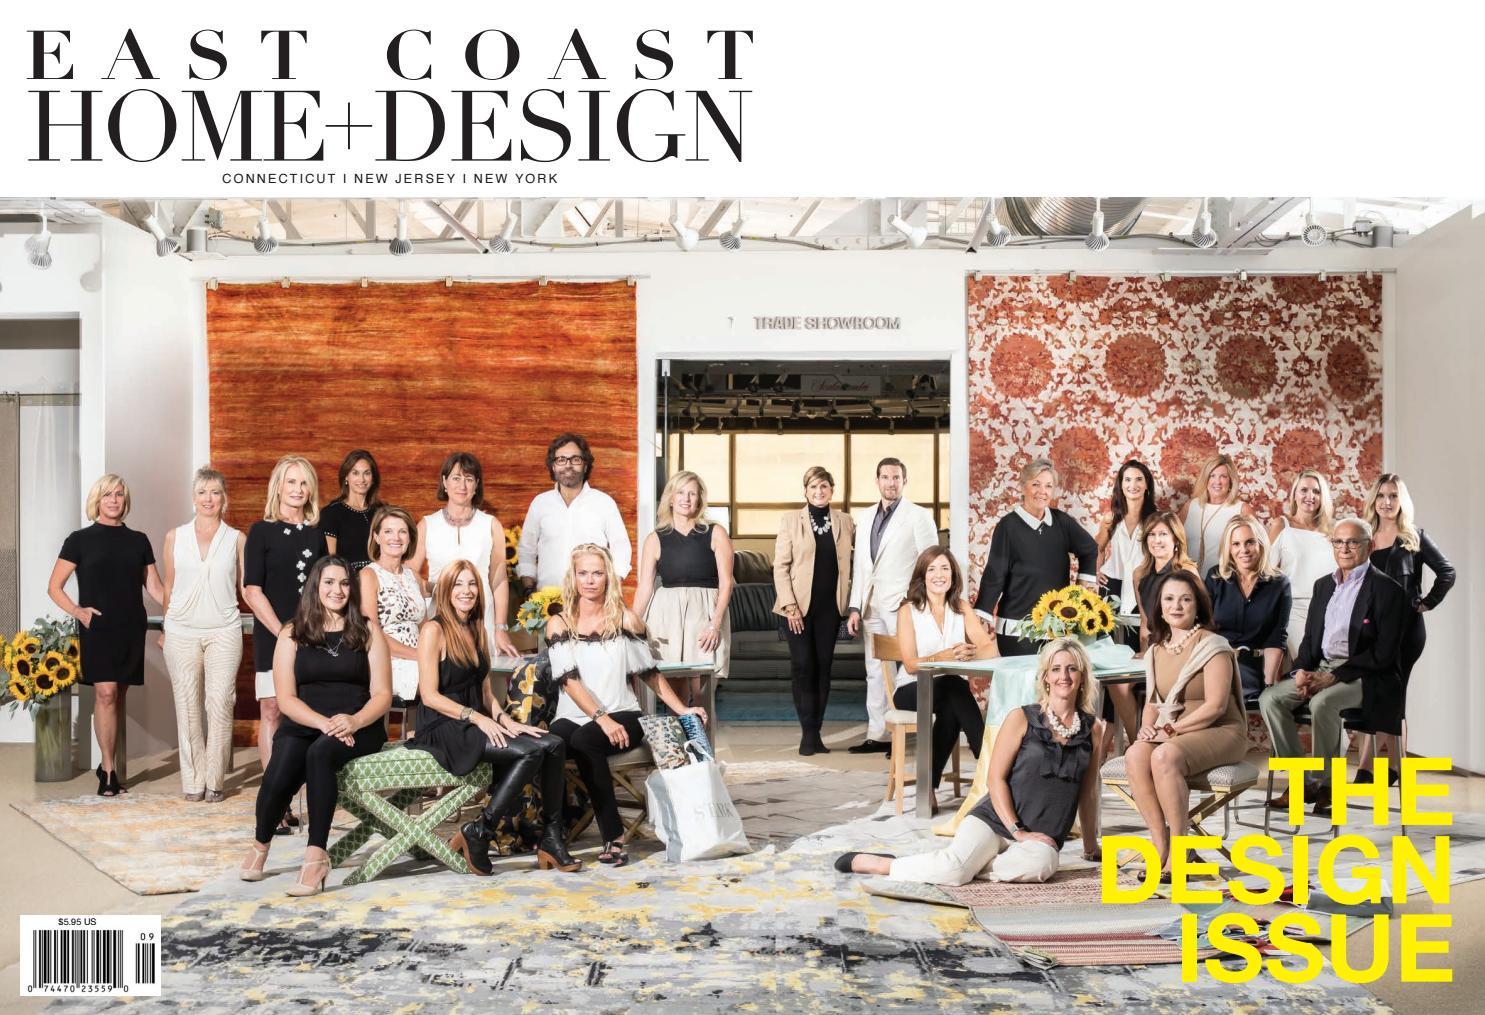 7fcbd92bef0b East Coast Home + Design V15 Issue 5 by East Coast Home Publishing - issuu